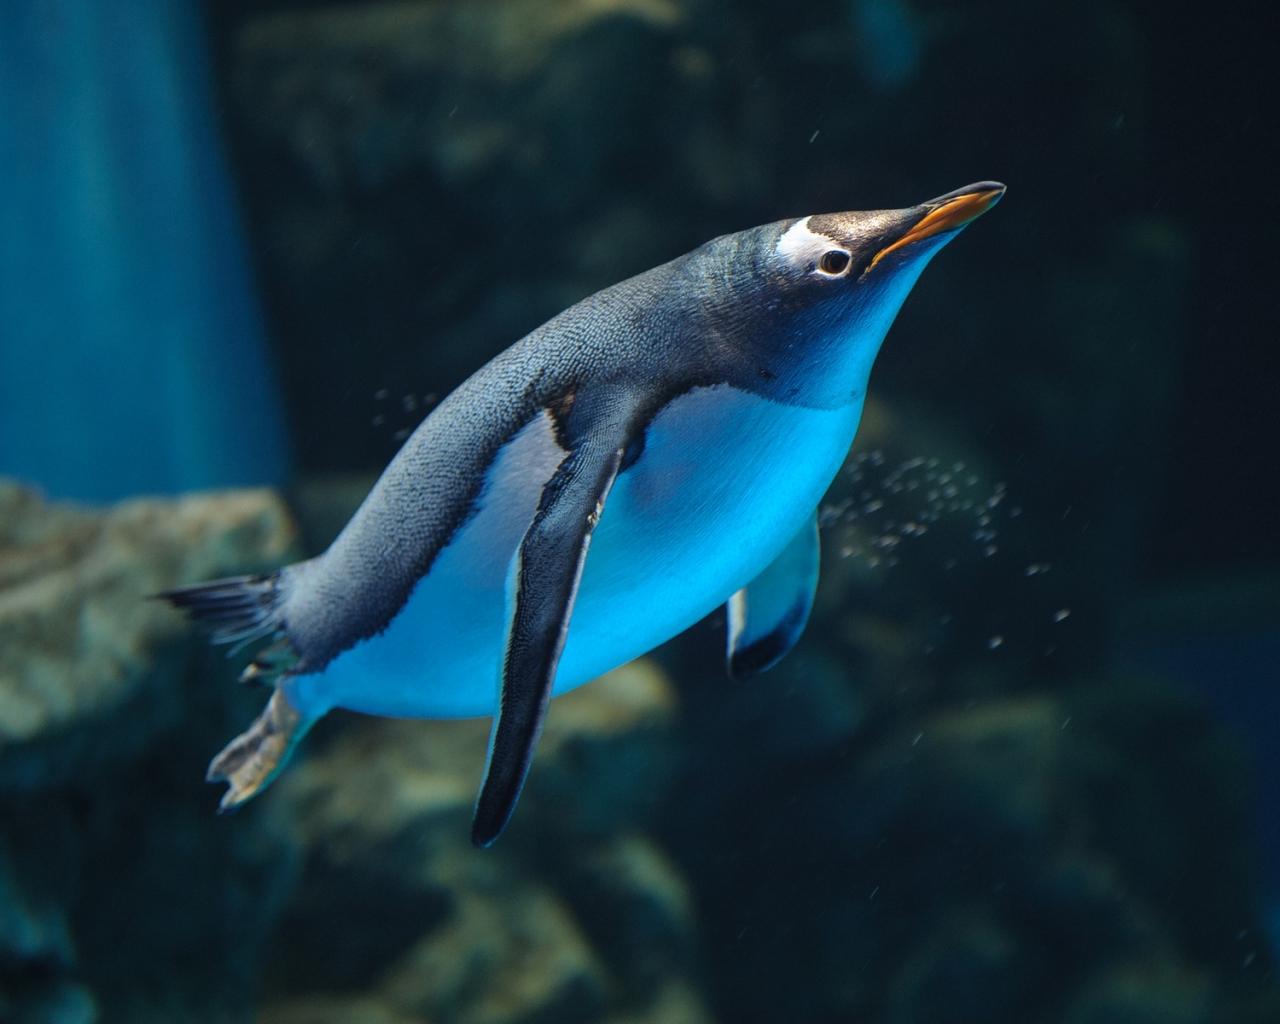 Un pinguino buceando - 1280x1024